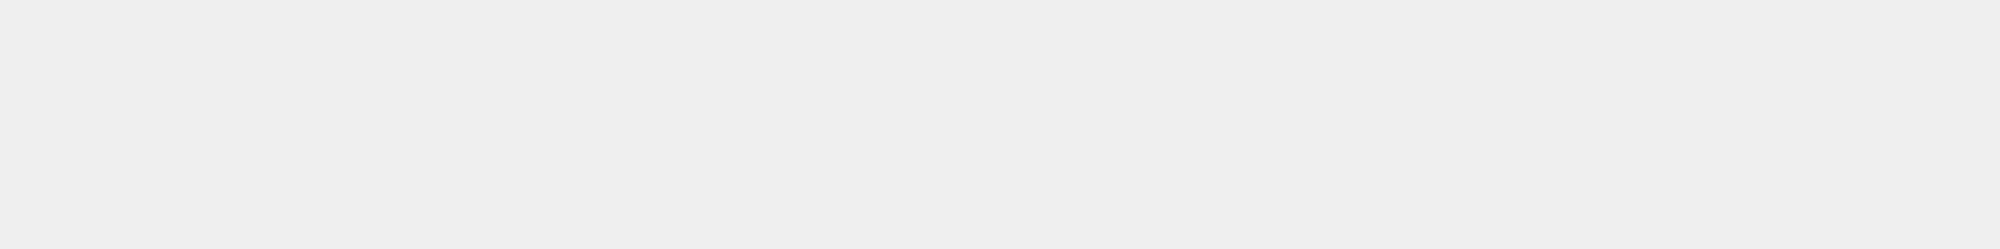 wave-bottom-grey-transparent